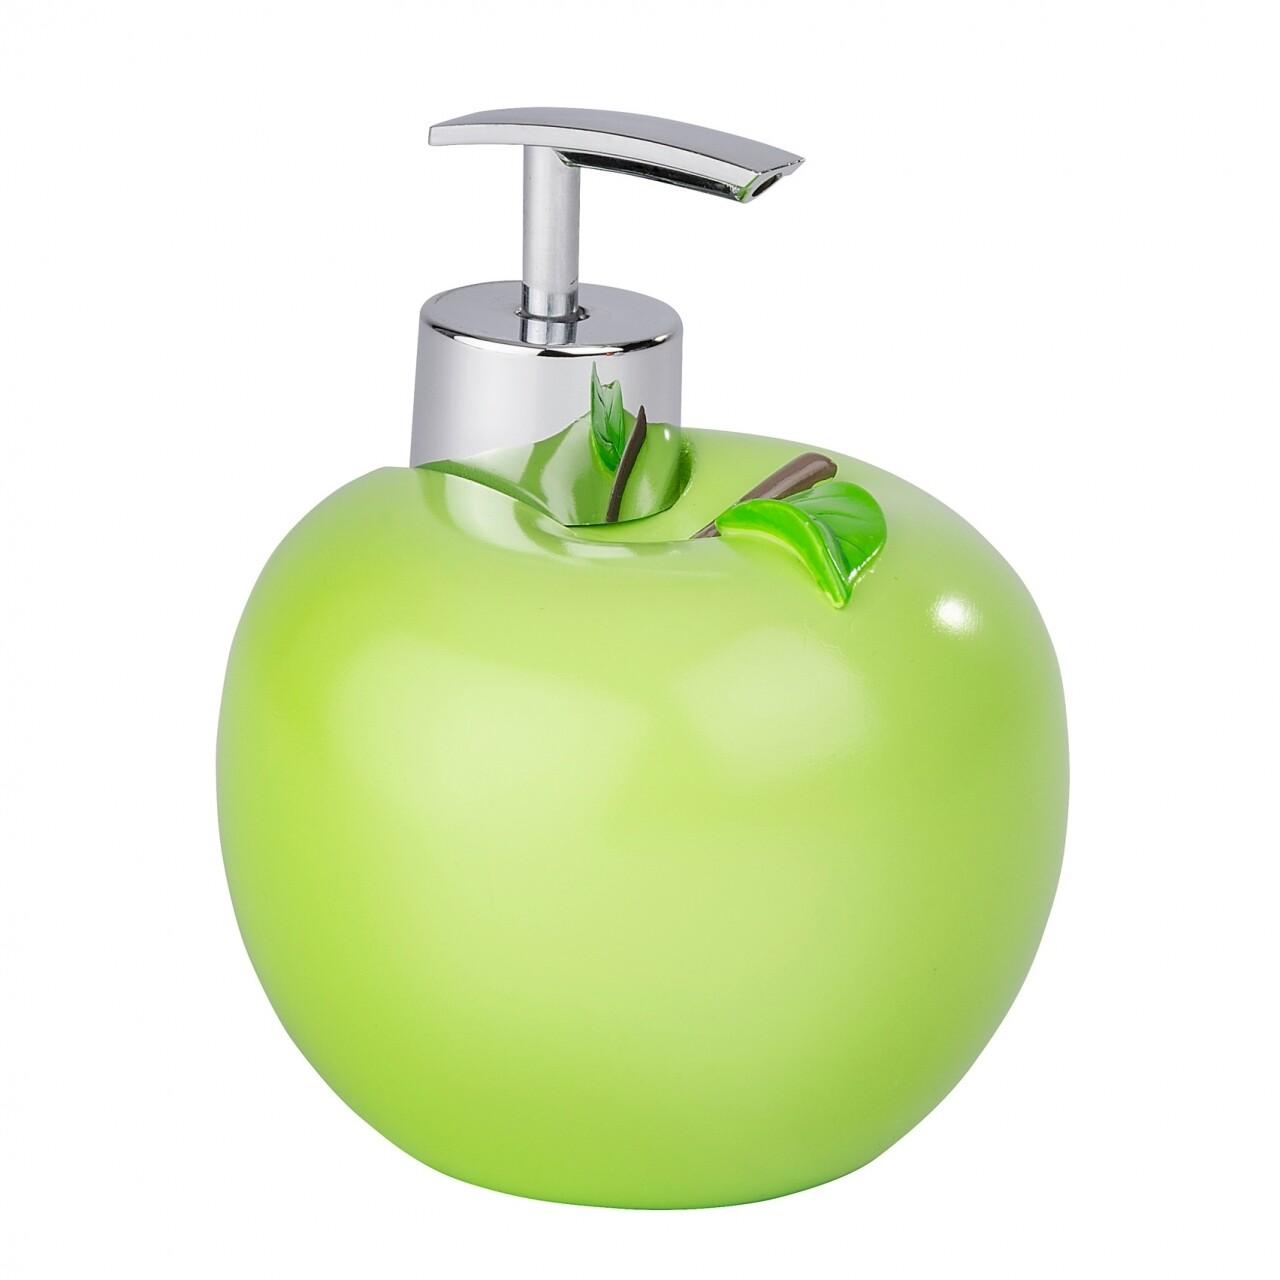 Dozator sapun Apple, Wenko, 10.5 x 12.5 cm, polirasina/ABS, portocaliu